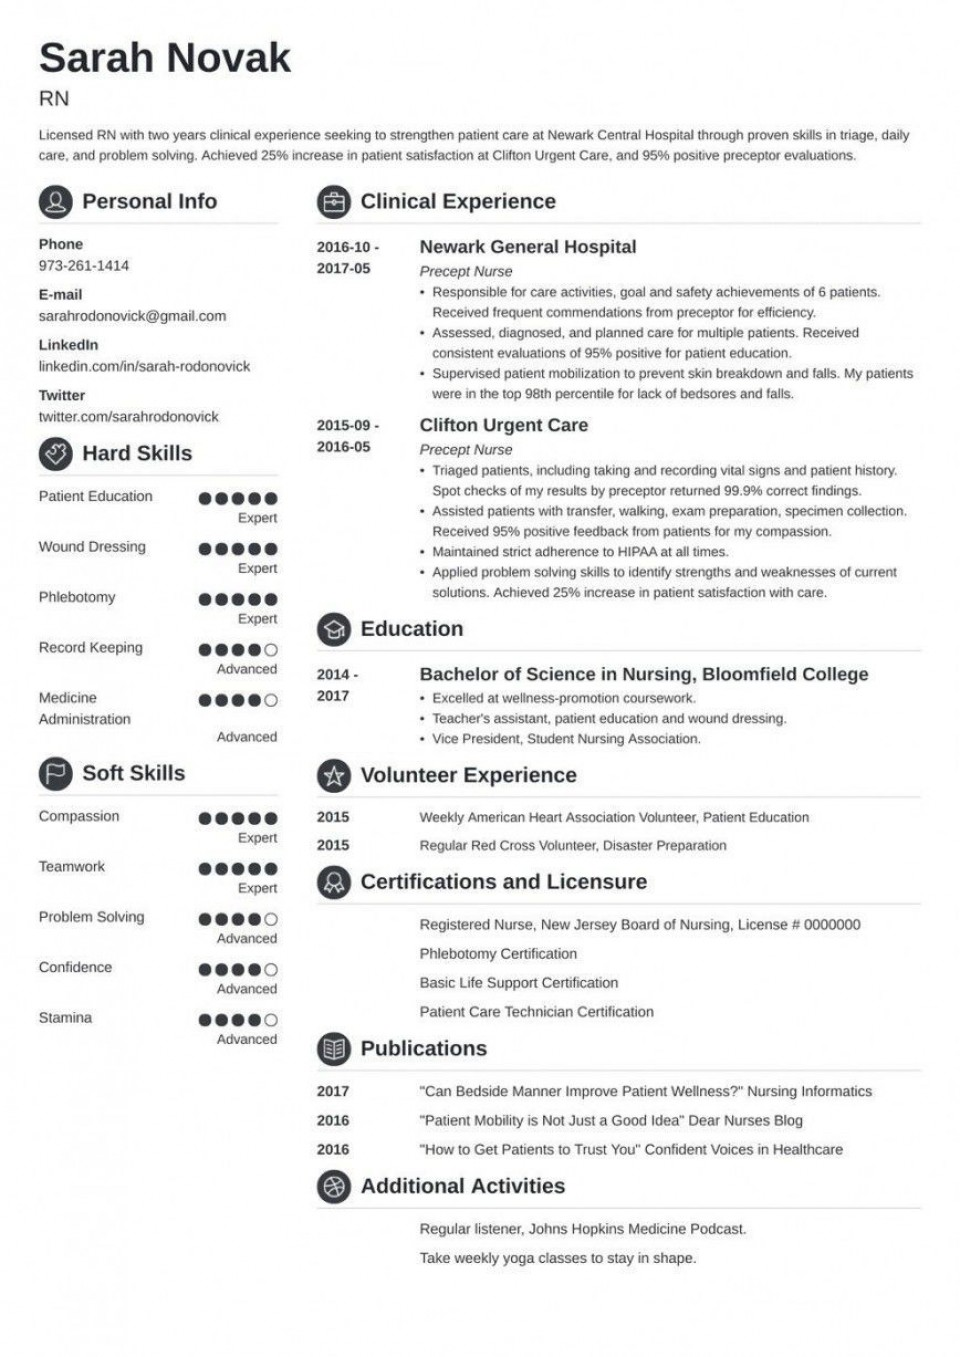 003 Unique New Rn Resume Template Sample 960